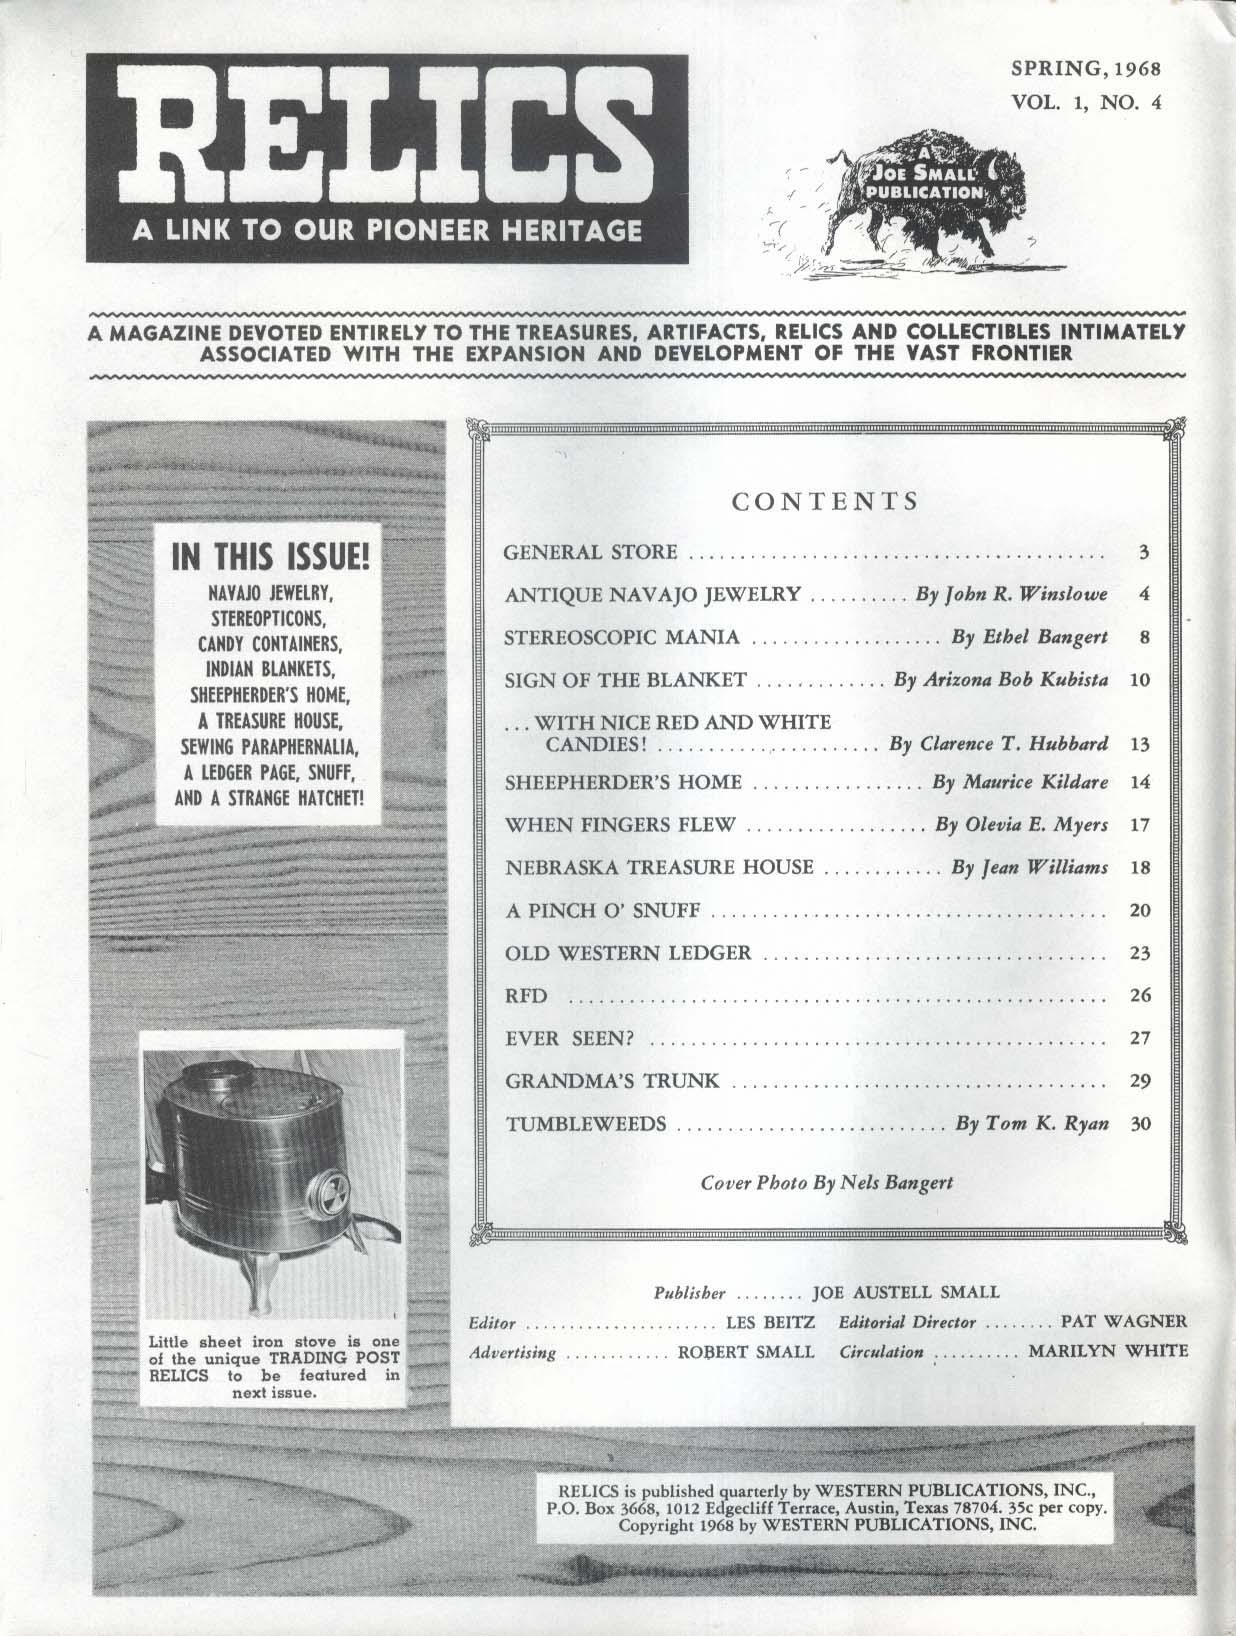 RELICS Navajo Jewelry Stereoscopic Nebraska Treasure House Spring 1968